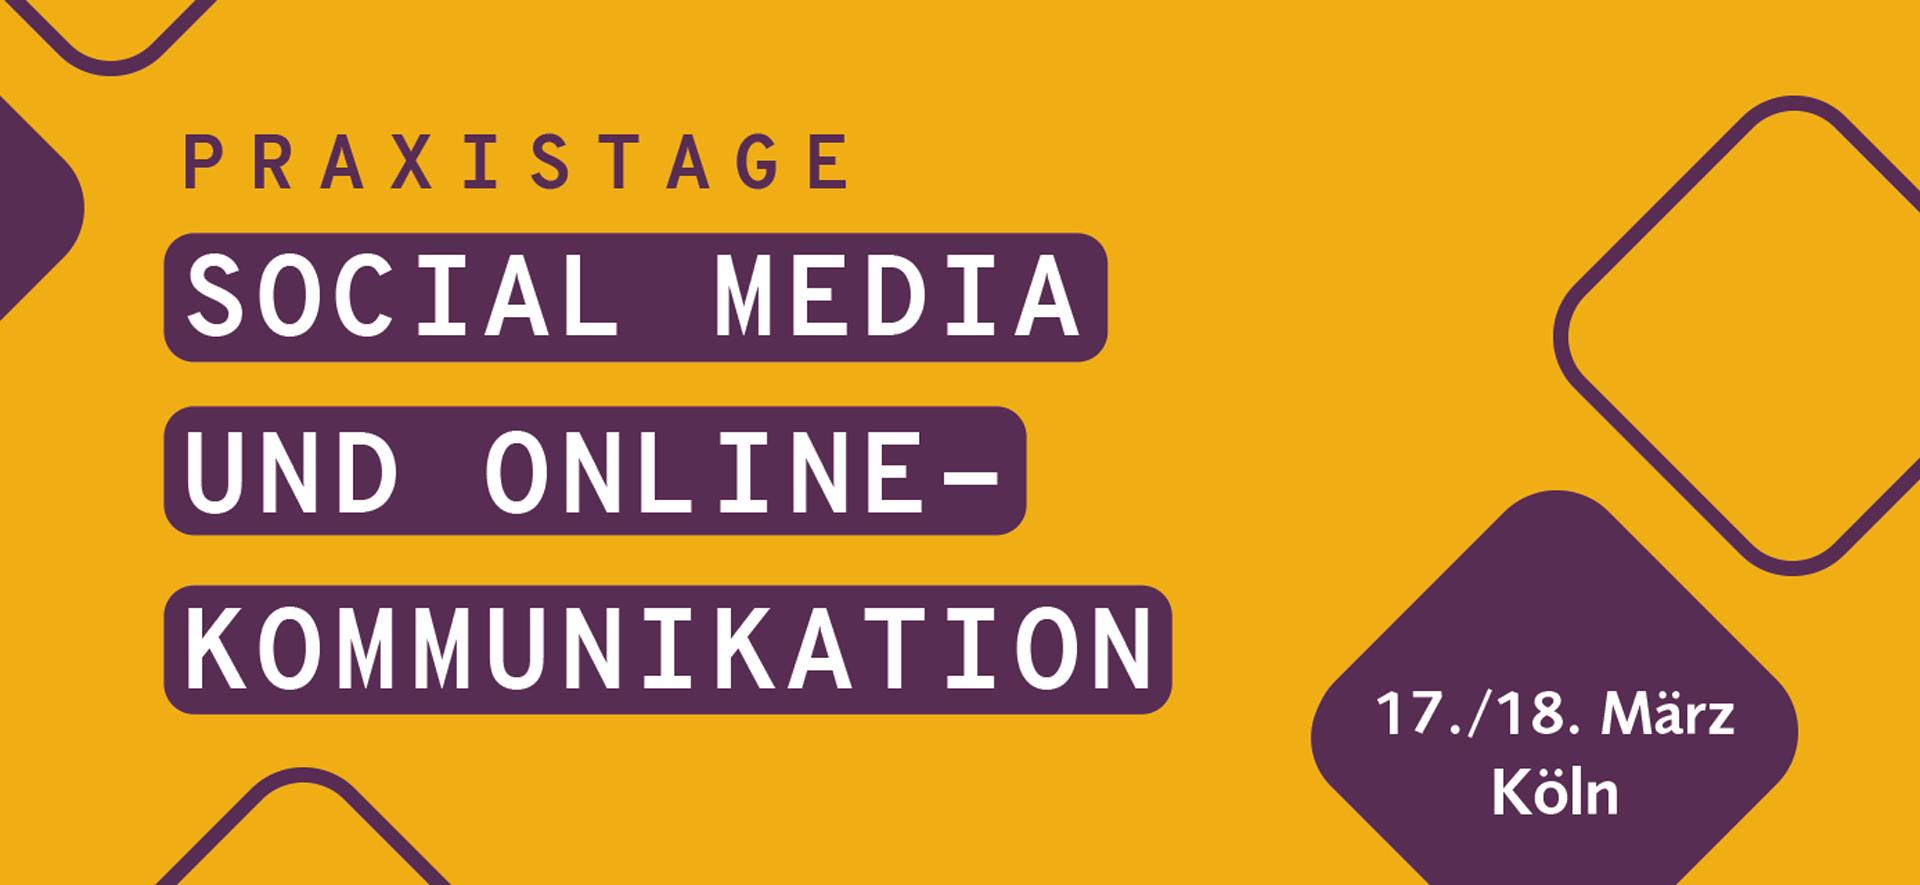 Praxistage Social Media und Onlinekommunikation 2020